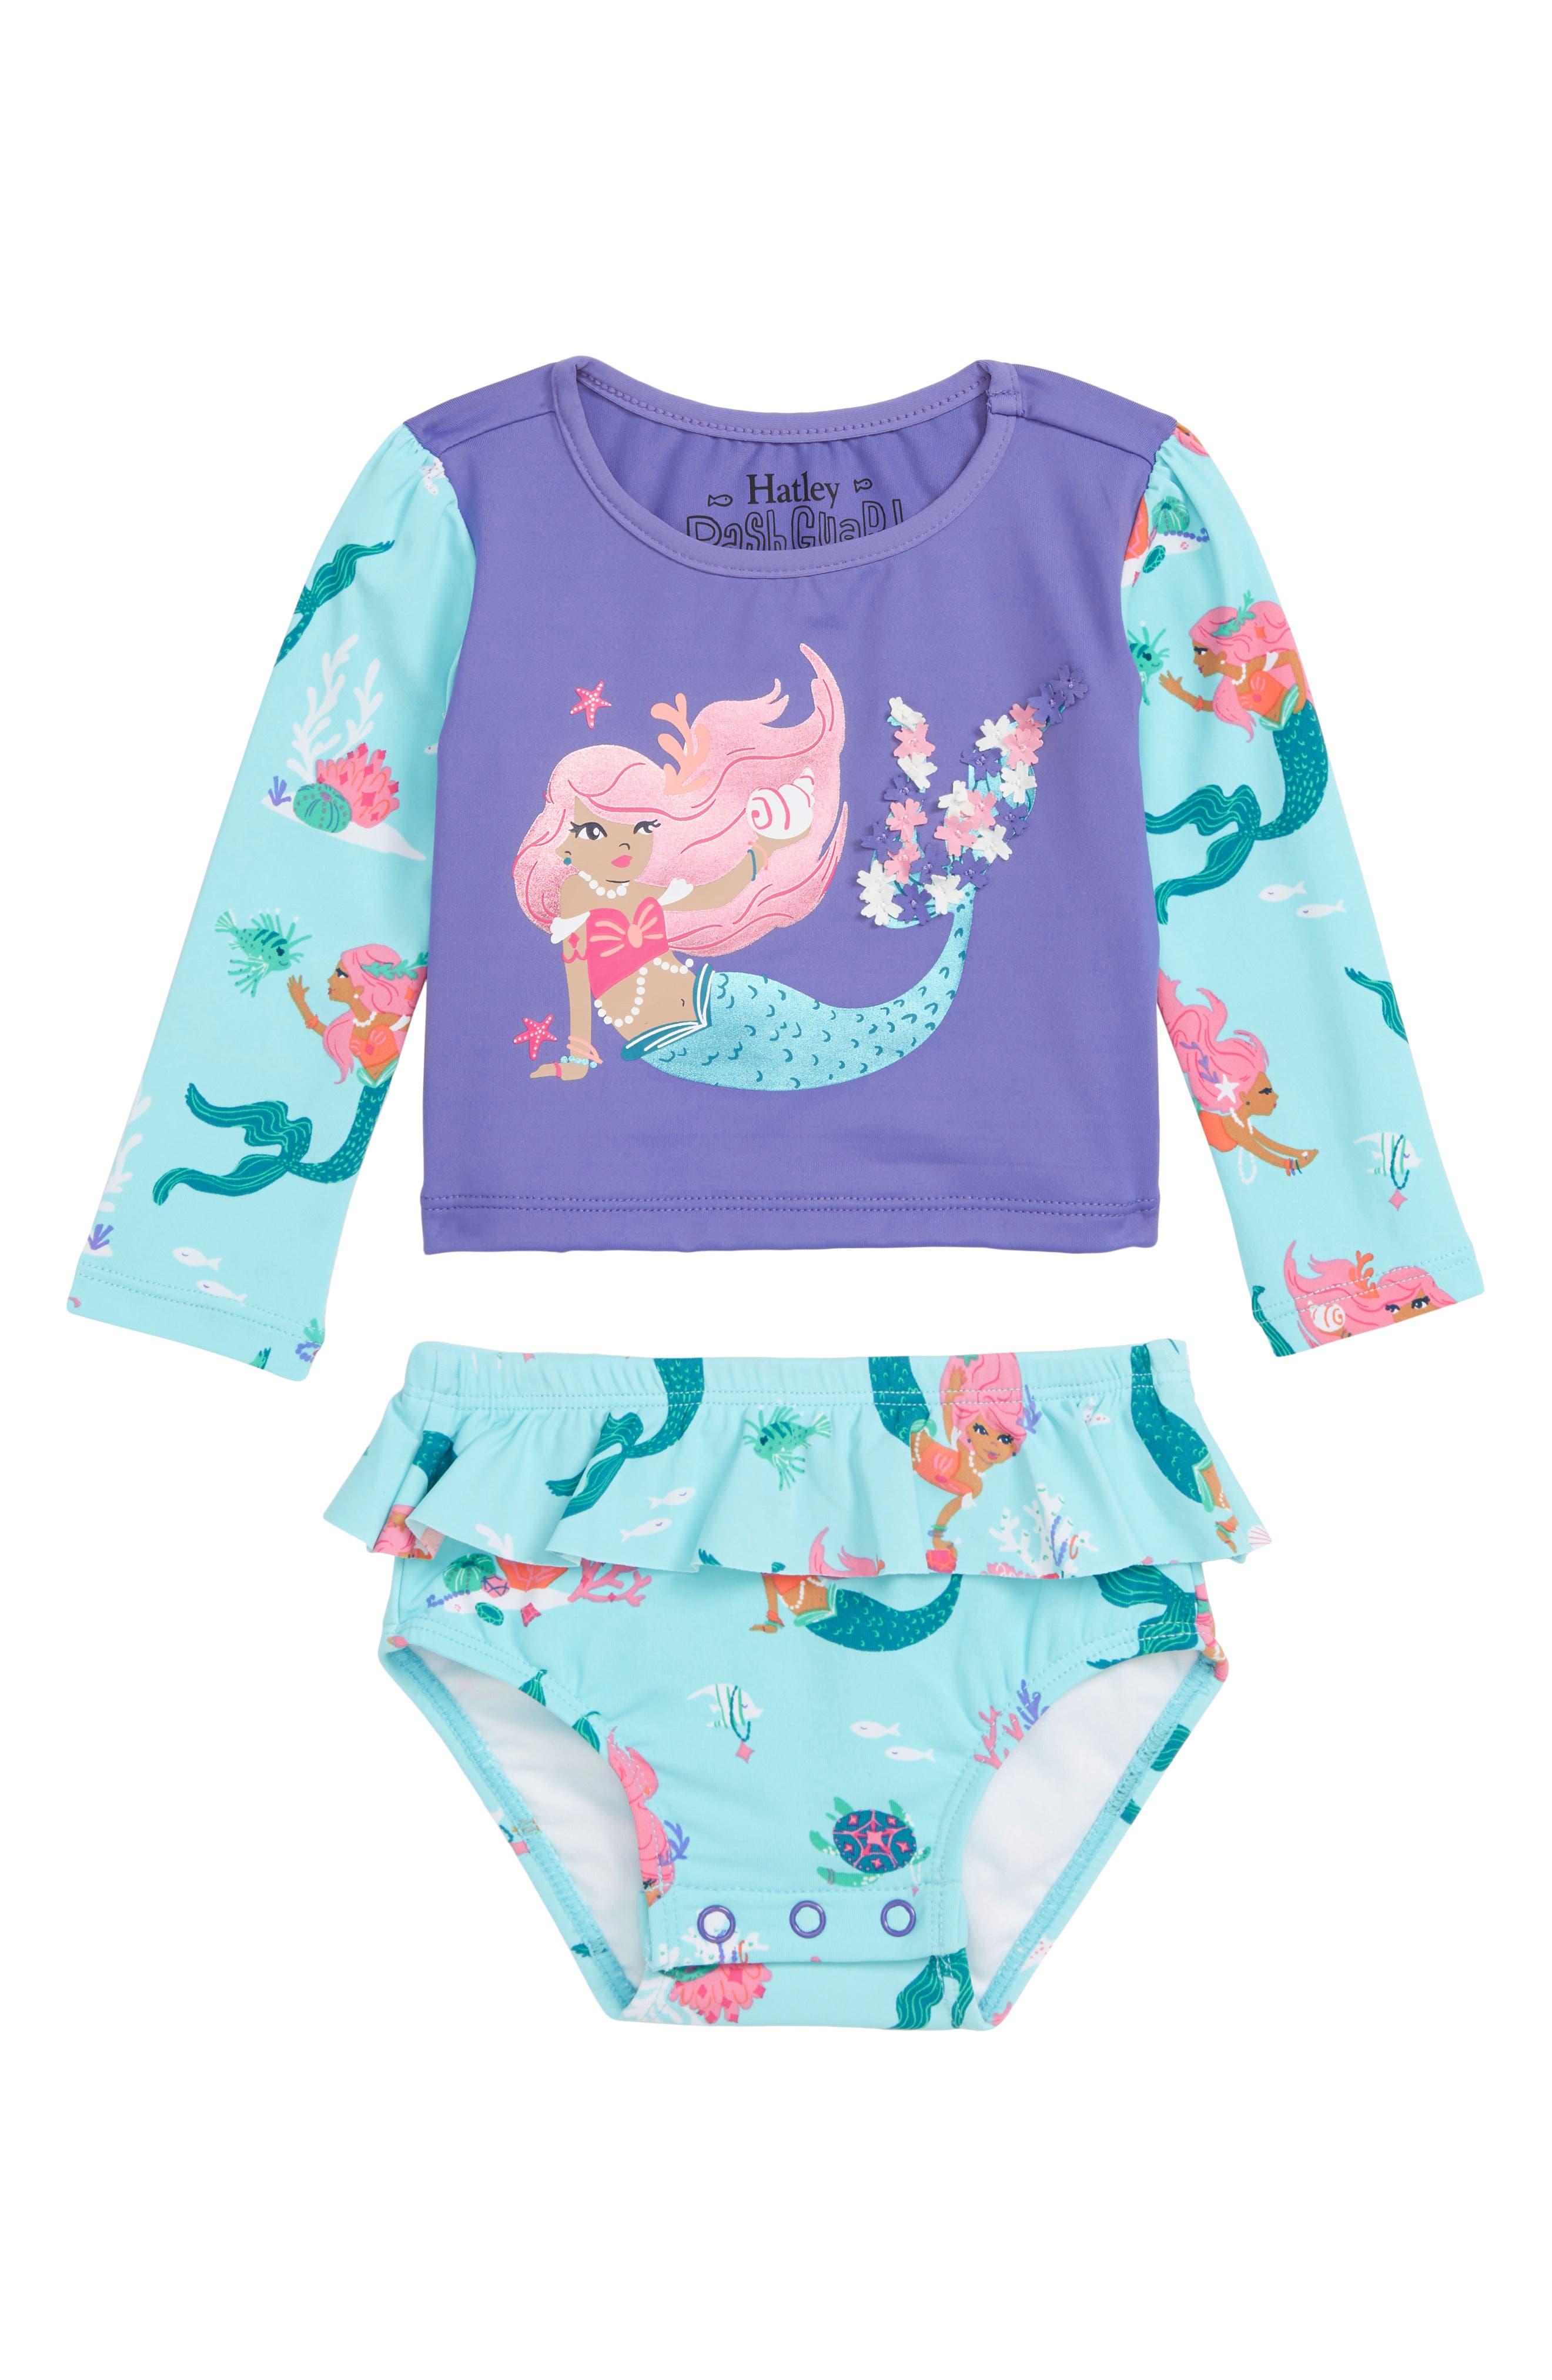 HATLEY, Mermaid Tales Two-Piece Rashguard Swimsuit, Main thumbnail 1, color, PURPLE